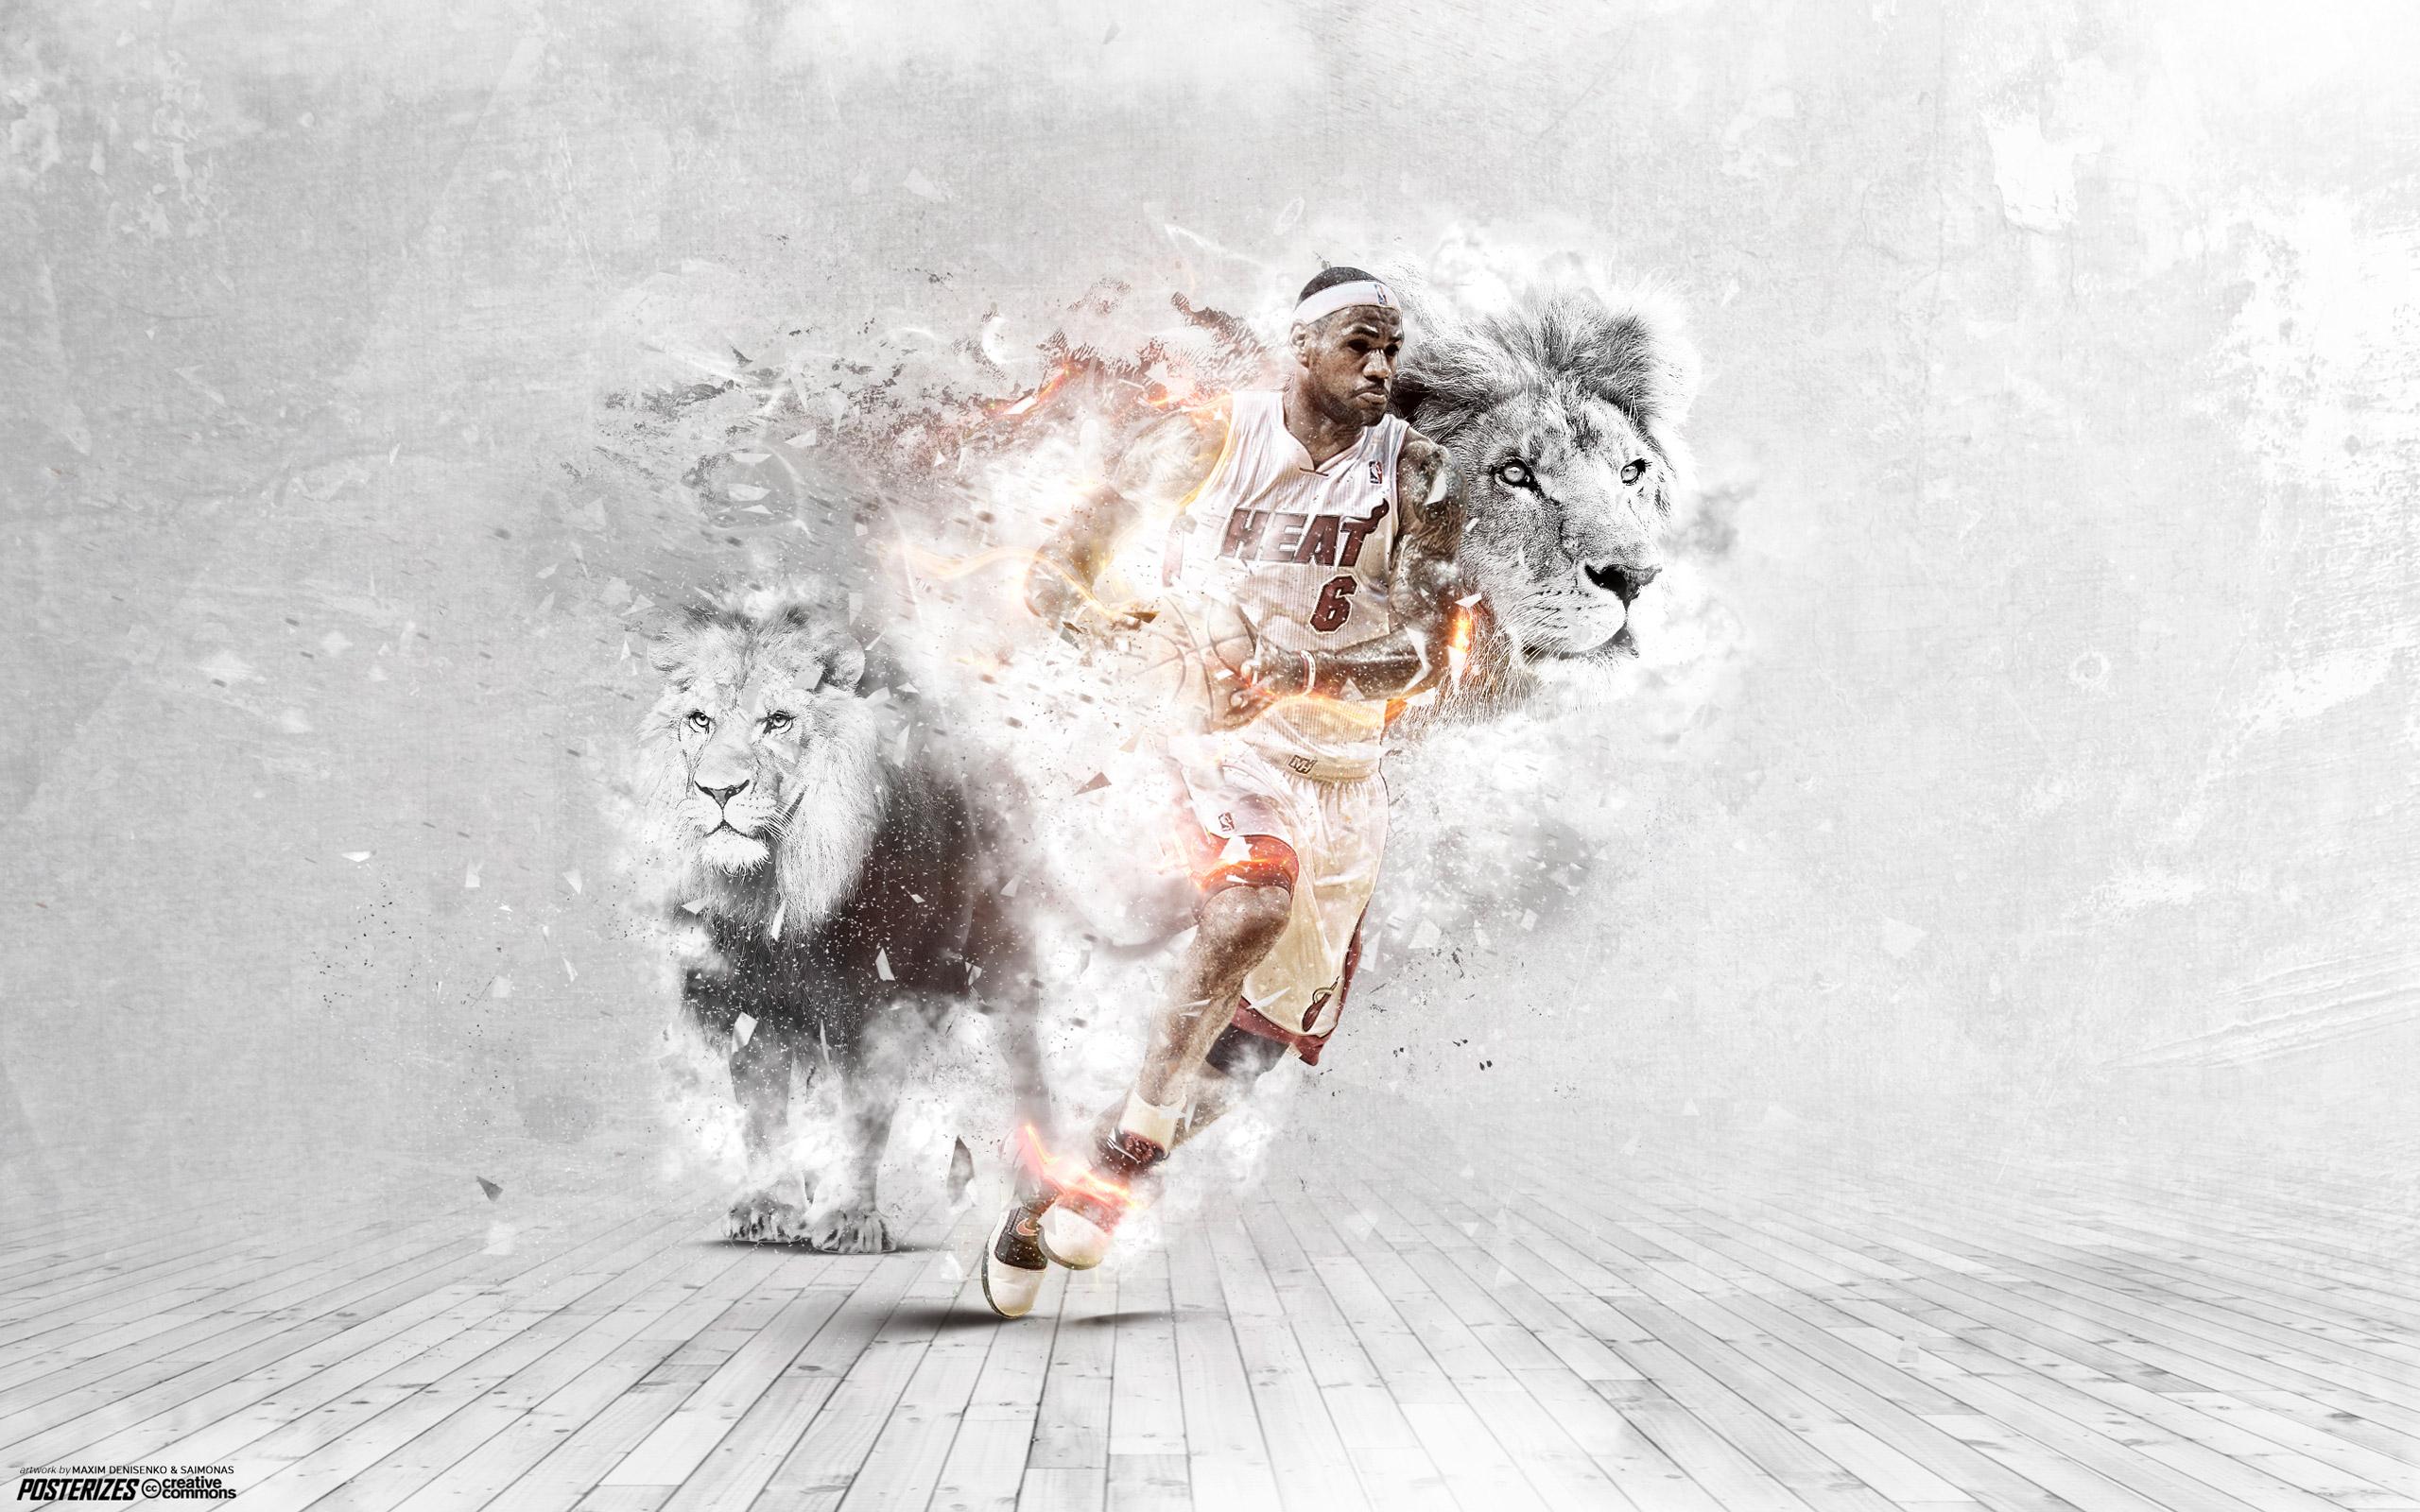 LeBron James Heat 2014 25601600 Wallpaper Basketball Wallpapers at 2560x1600